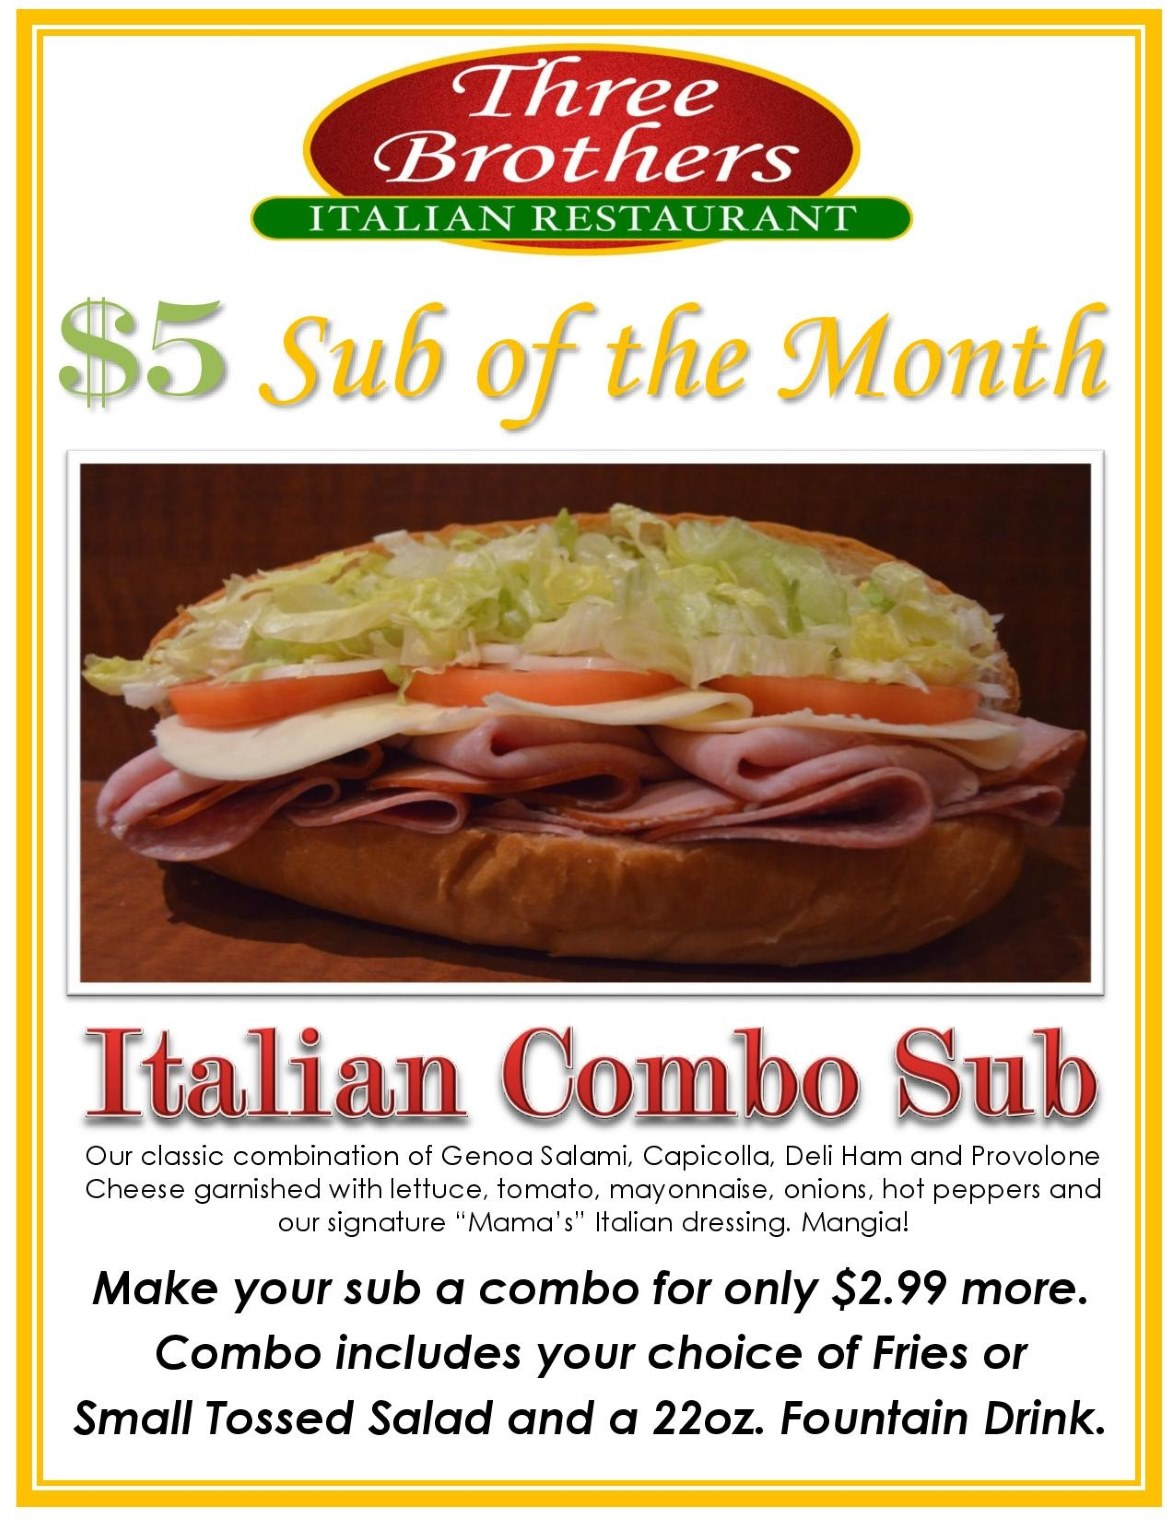 Italian Combo Sub